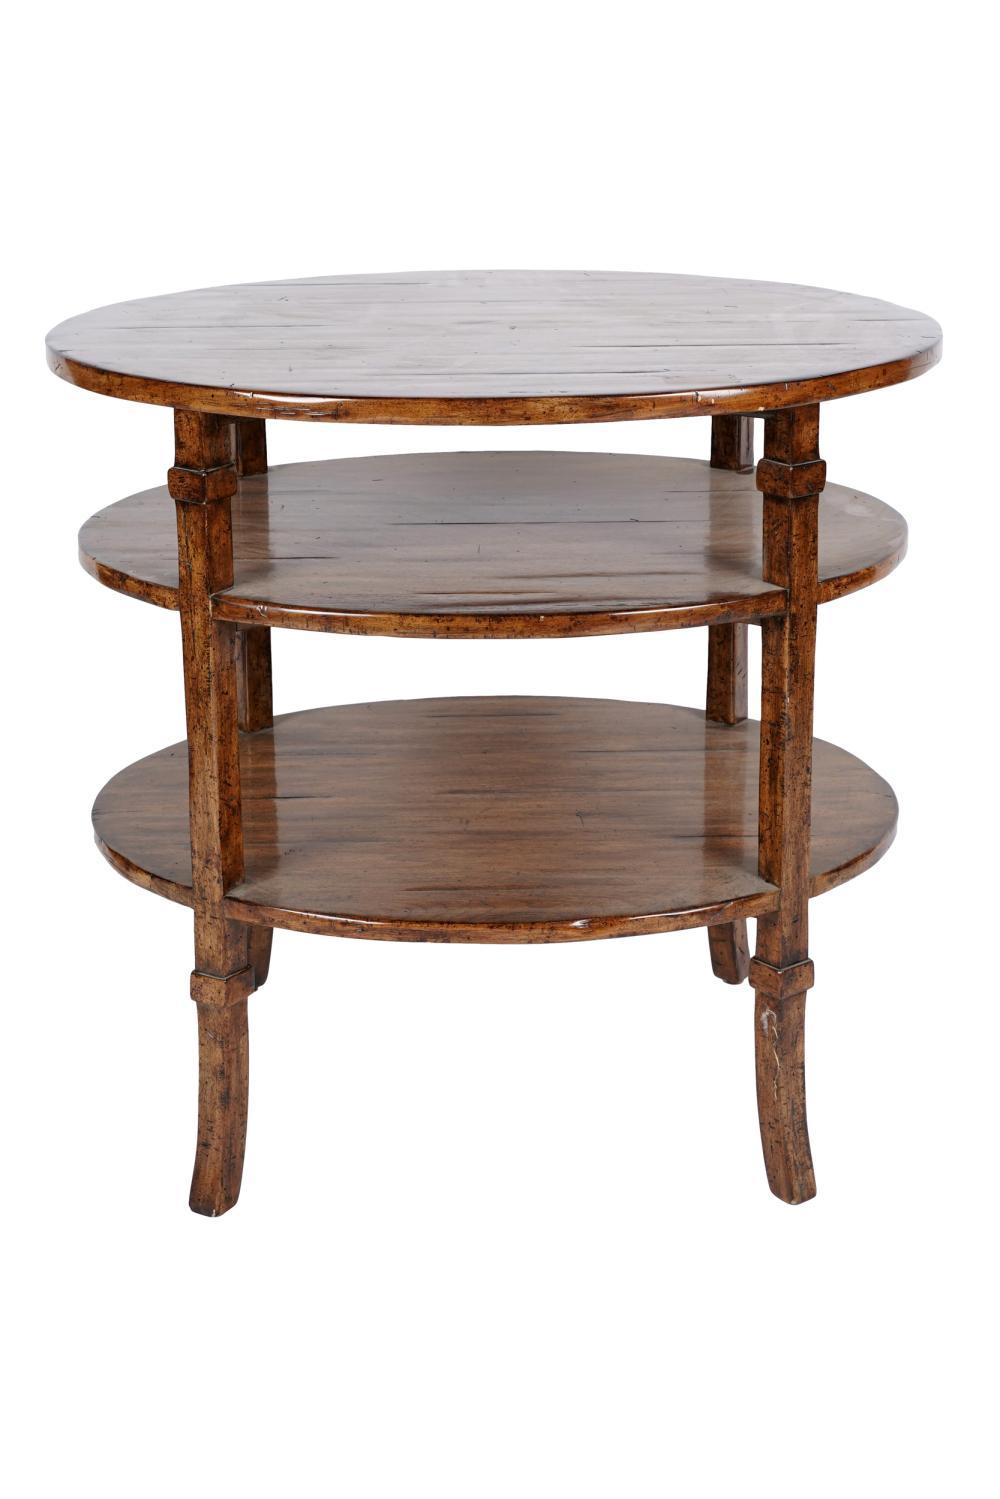 BAUSMAN TIERED WALNUT SIDE TABLE